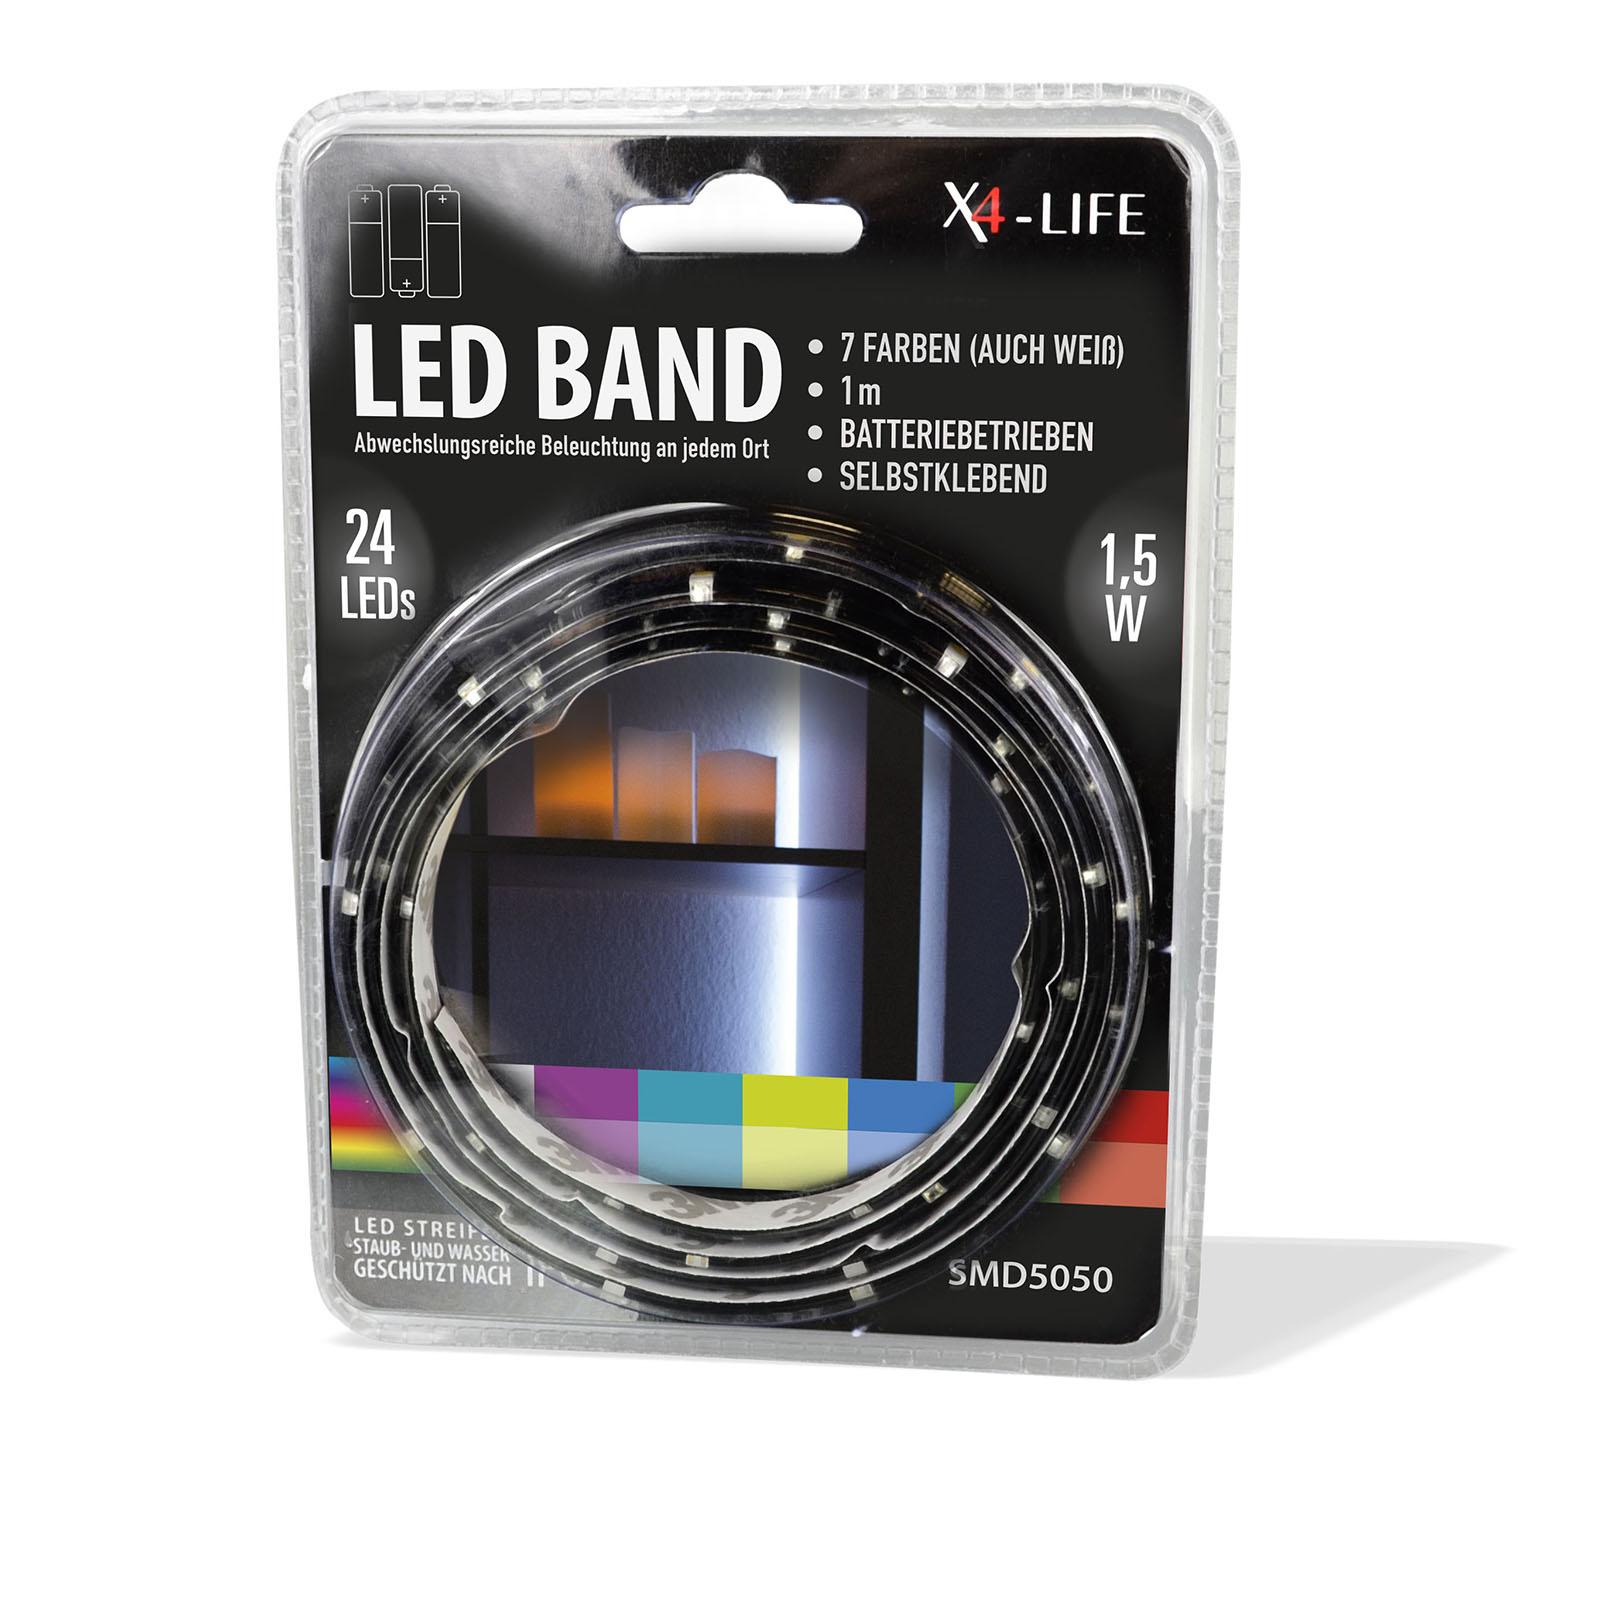 Fabulous X4-LIFE RGB LED Band 1m SMD5050 Batterie / Selbstklebend / IP65 IQ58